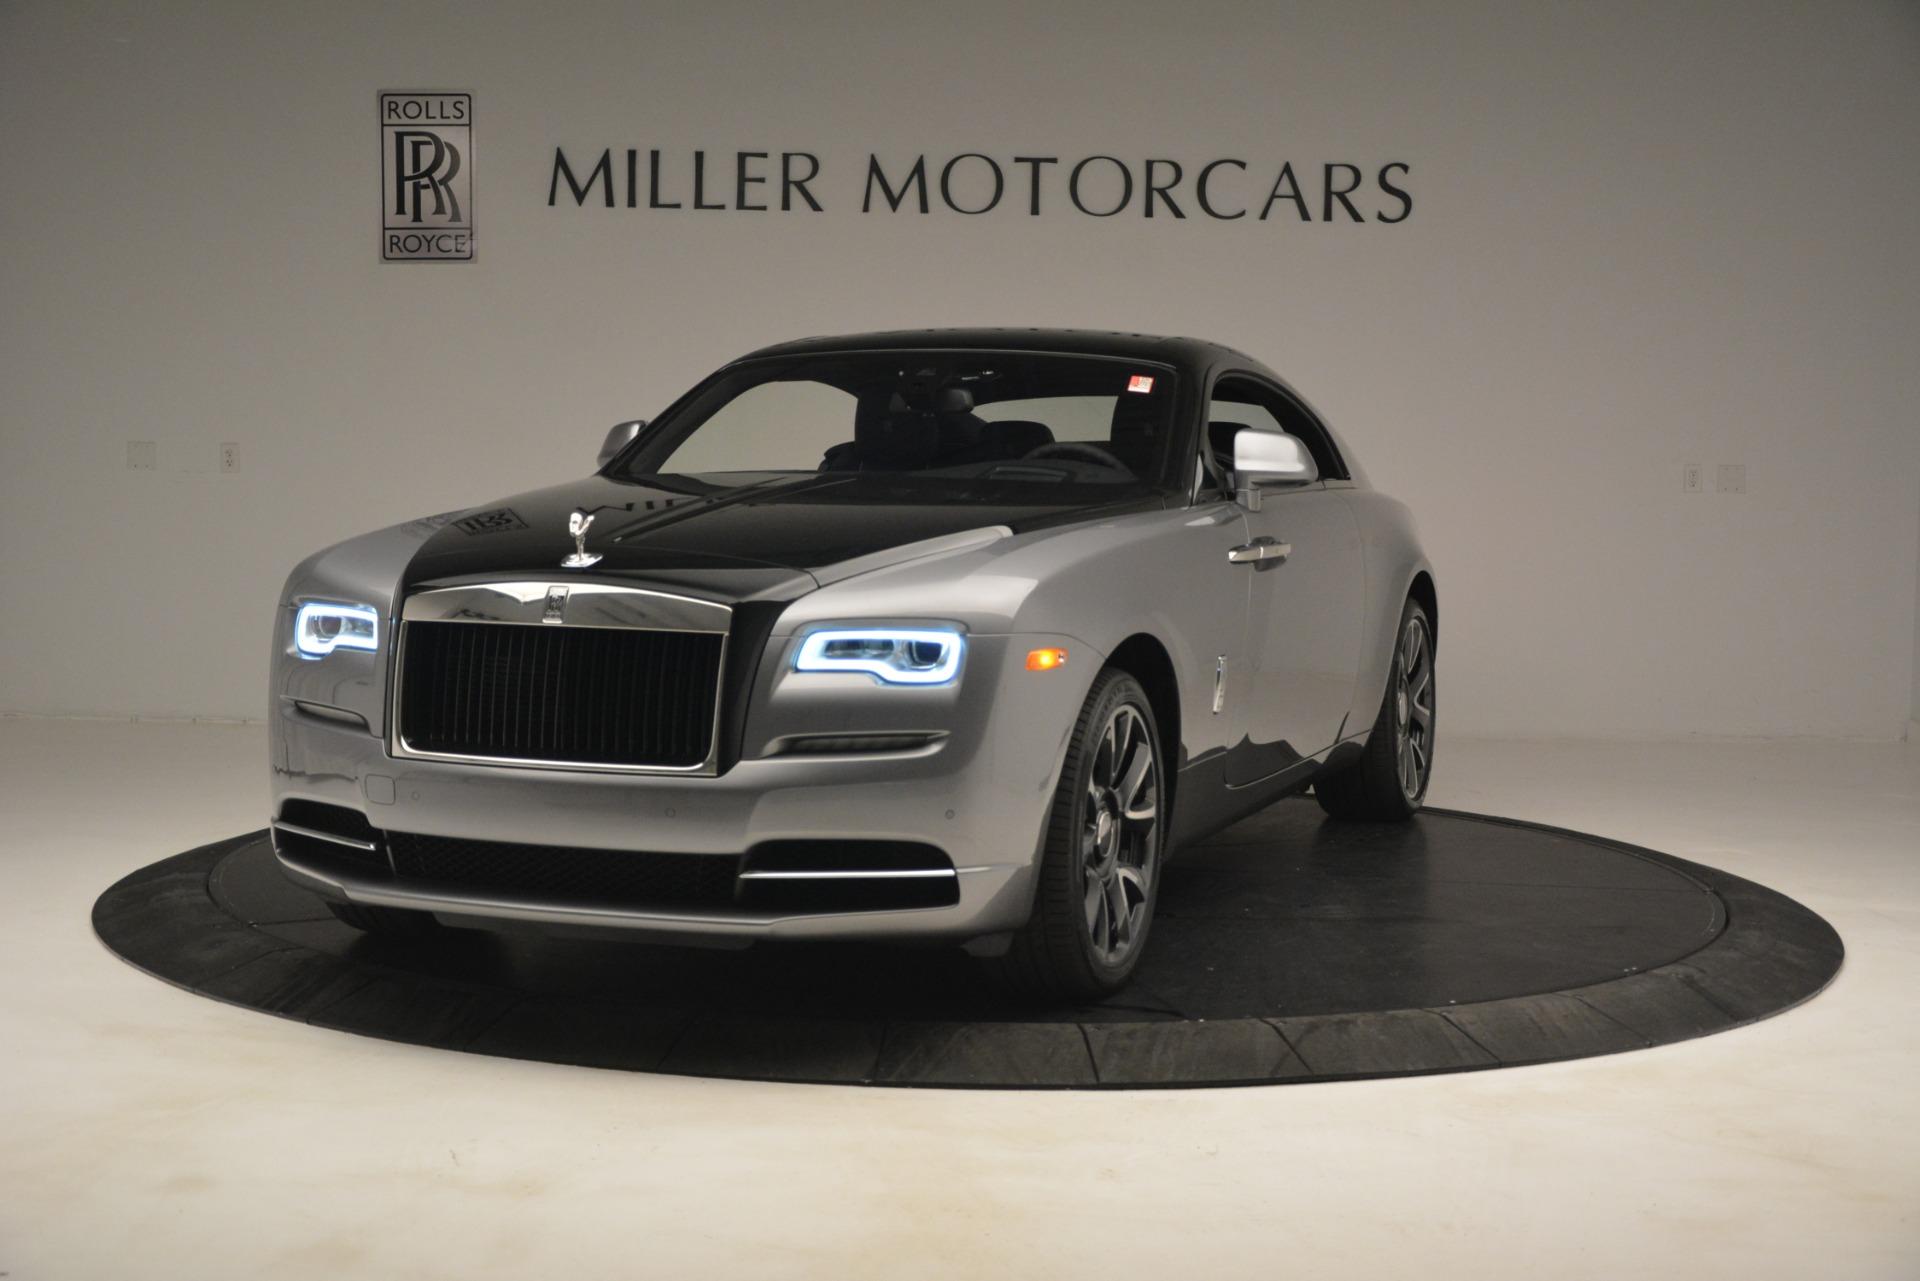 New 2019 Rolls-Royce Wraith for sale Sold at Alfa Romeo of Westport in Westport CT 06880 1